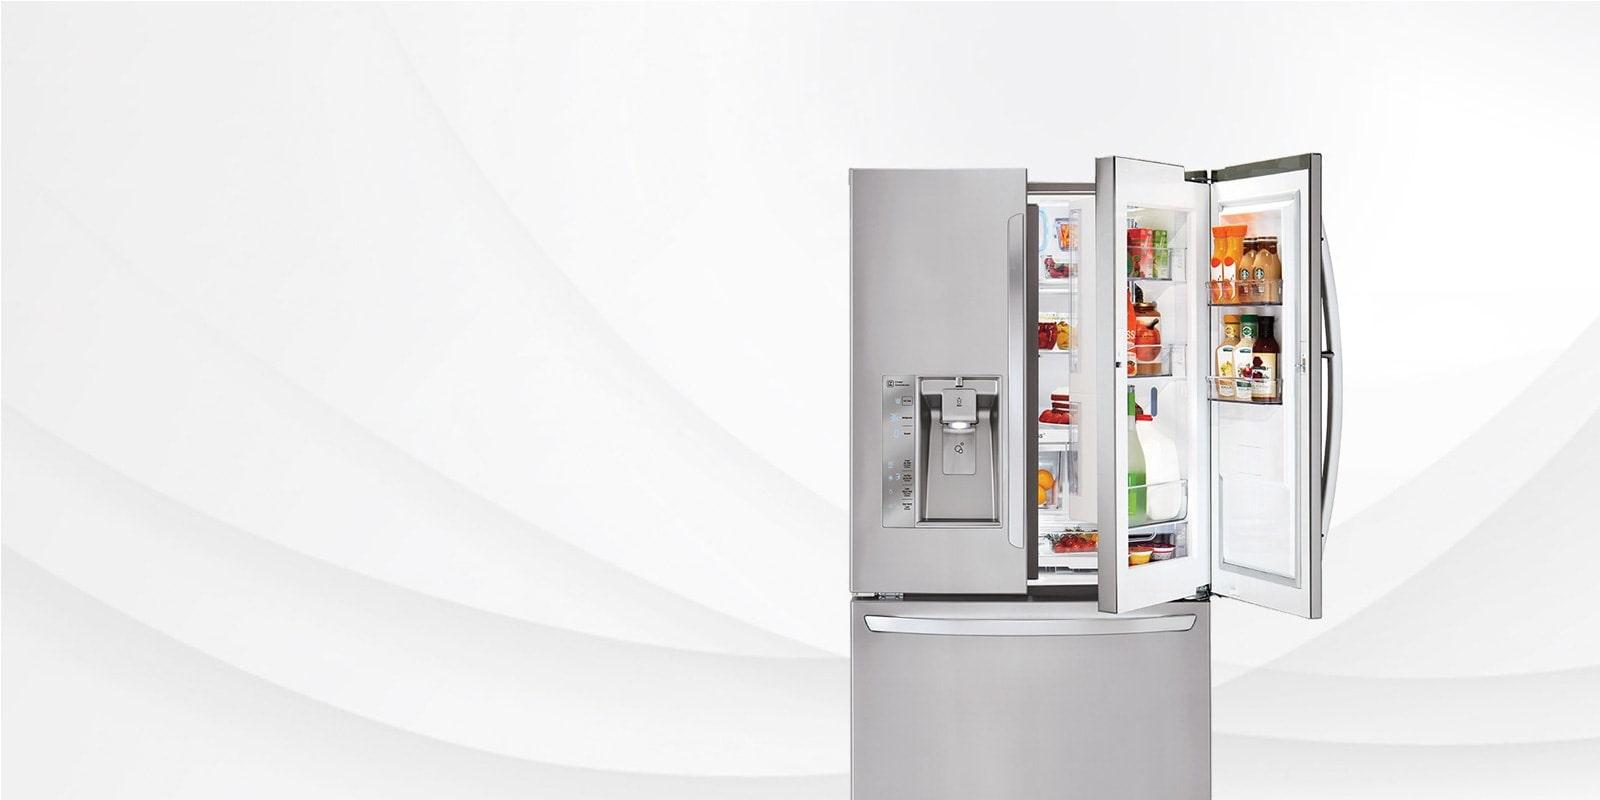 LG Smart Cooling & French Door Counter Depth Fridges   LG Canada on